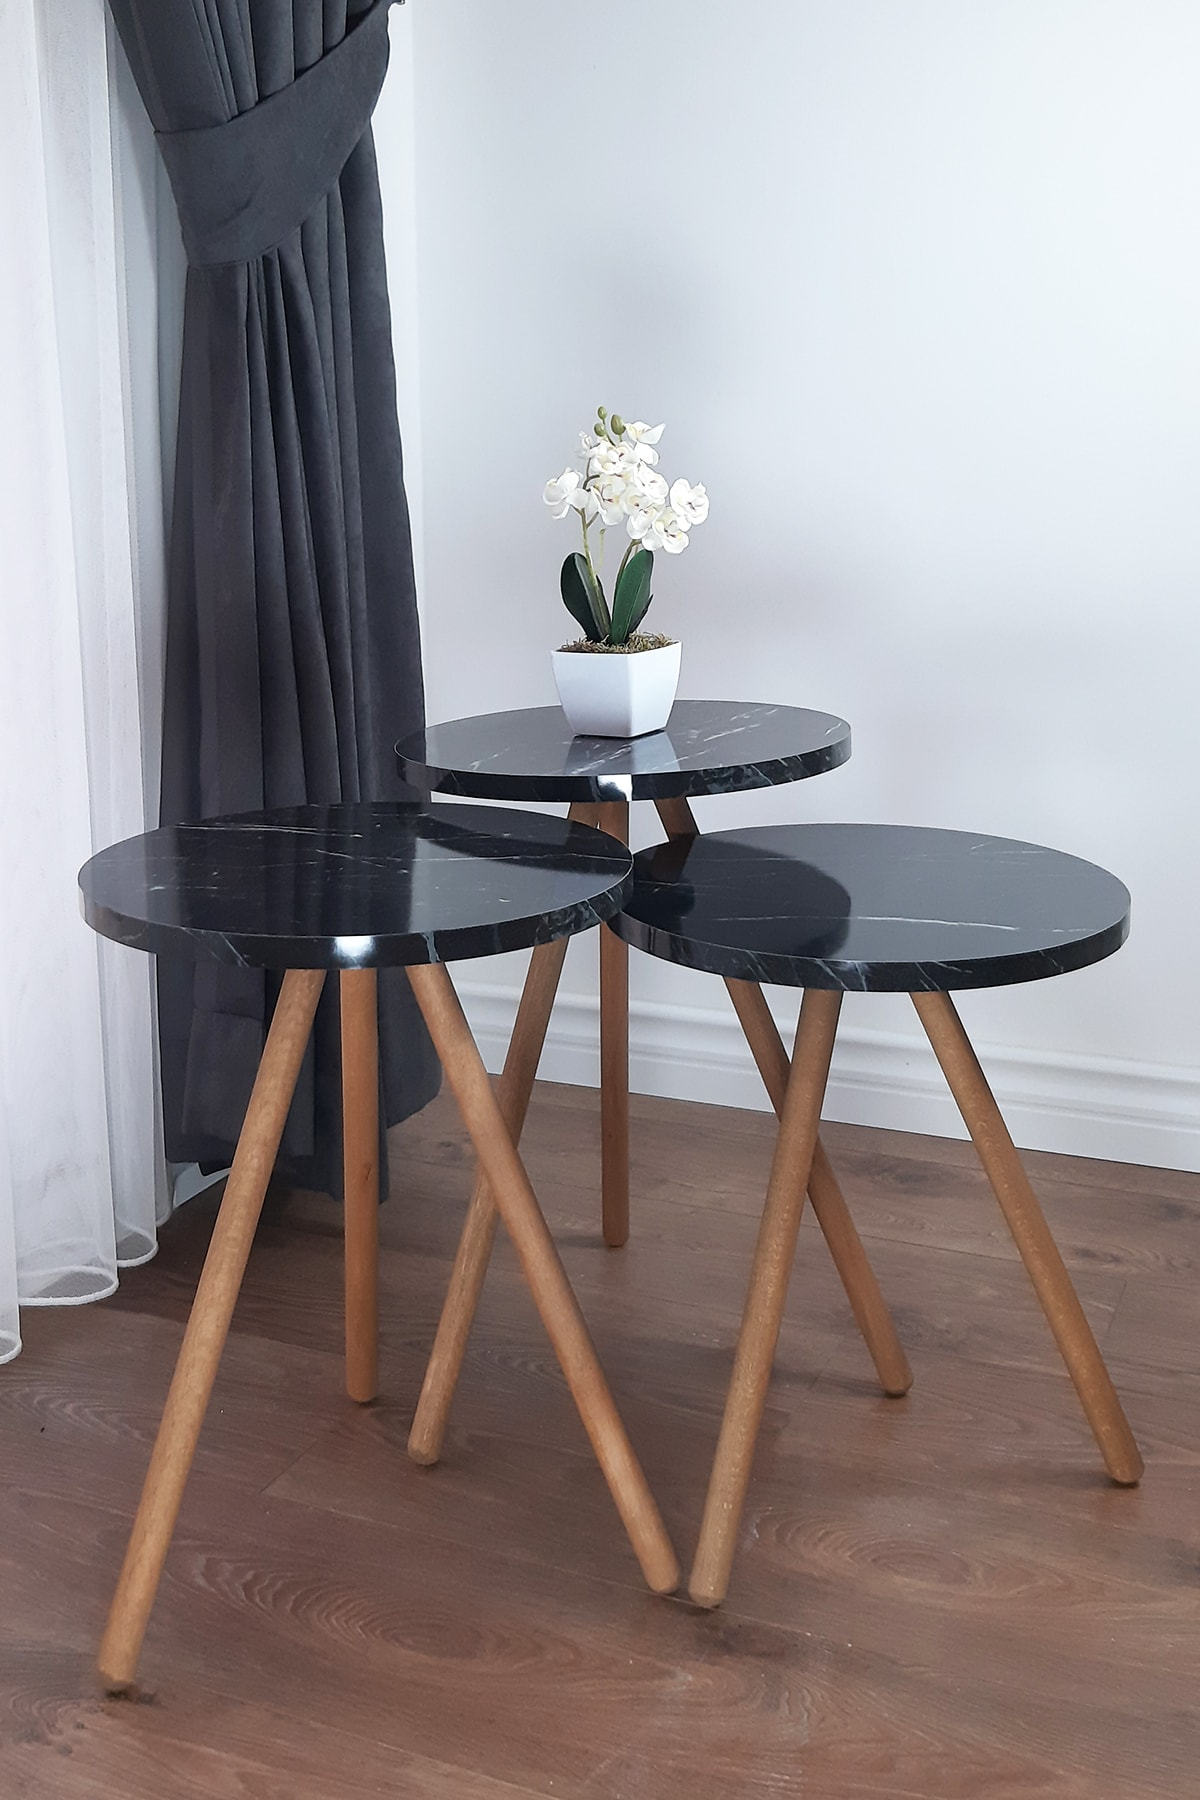 interGO Siyah Üçlü Zigon Sehpa Ahşap Ayaklı Yuvarlak Tasarım Bendir 1